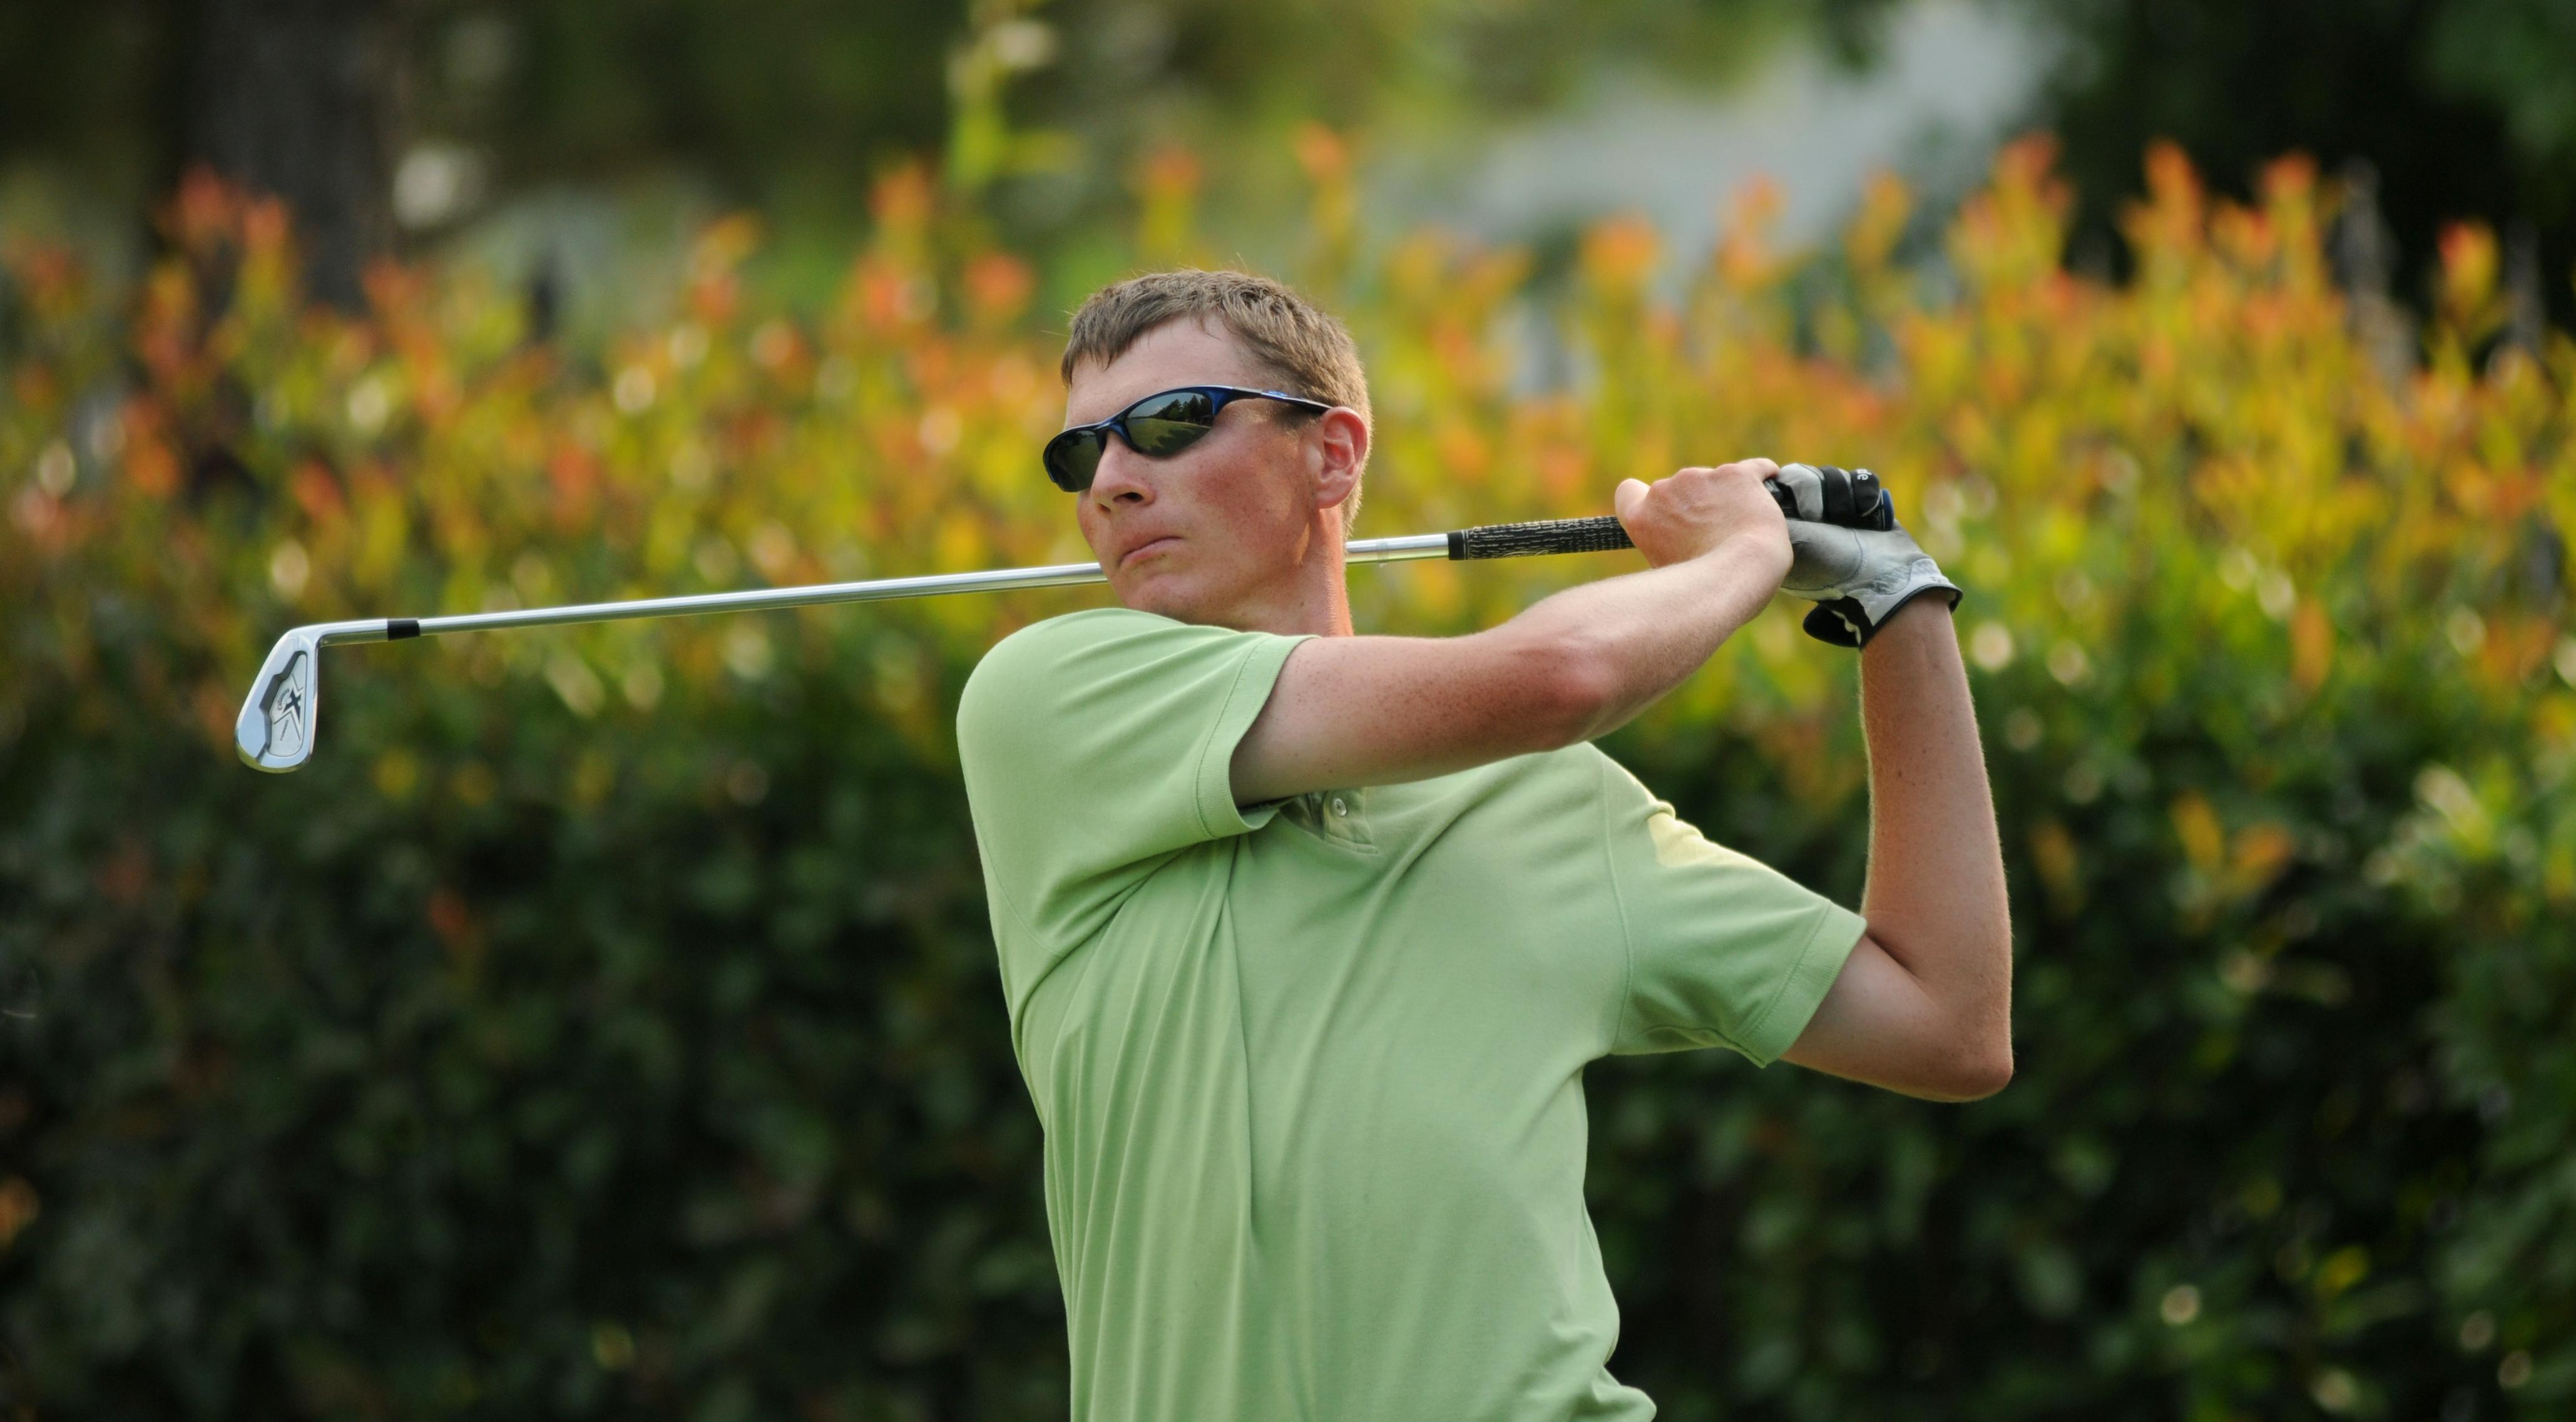 06.14.09_golf2.jpg